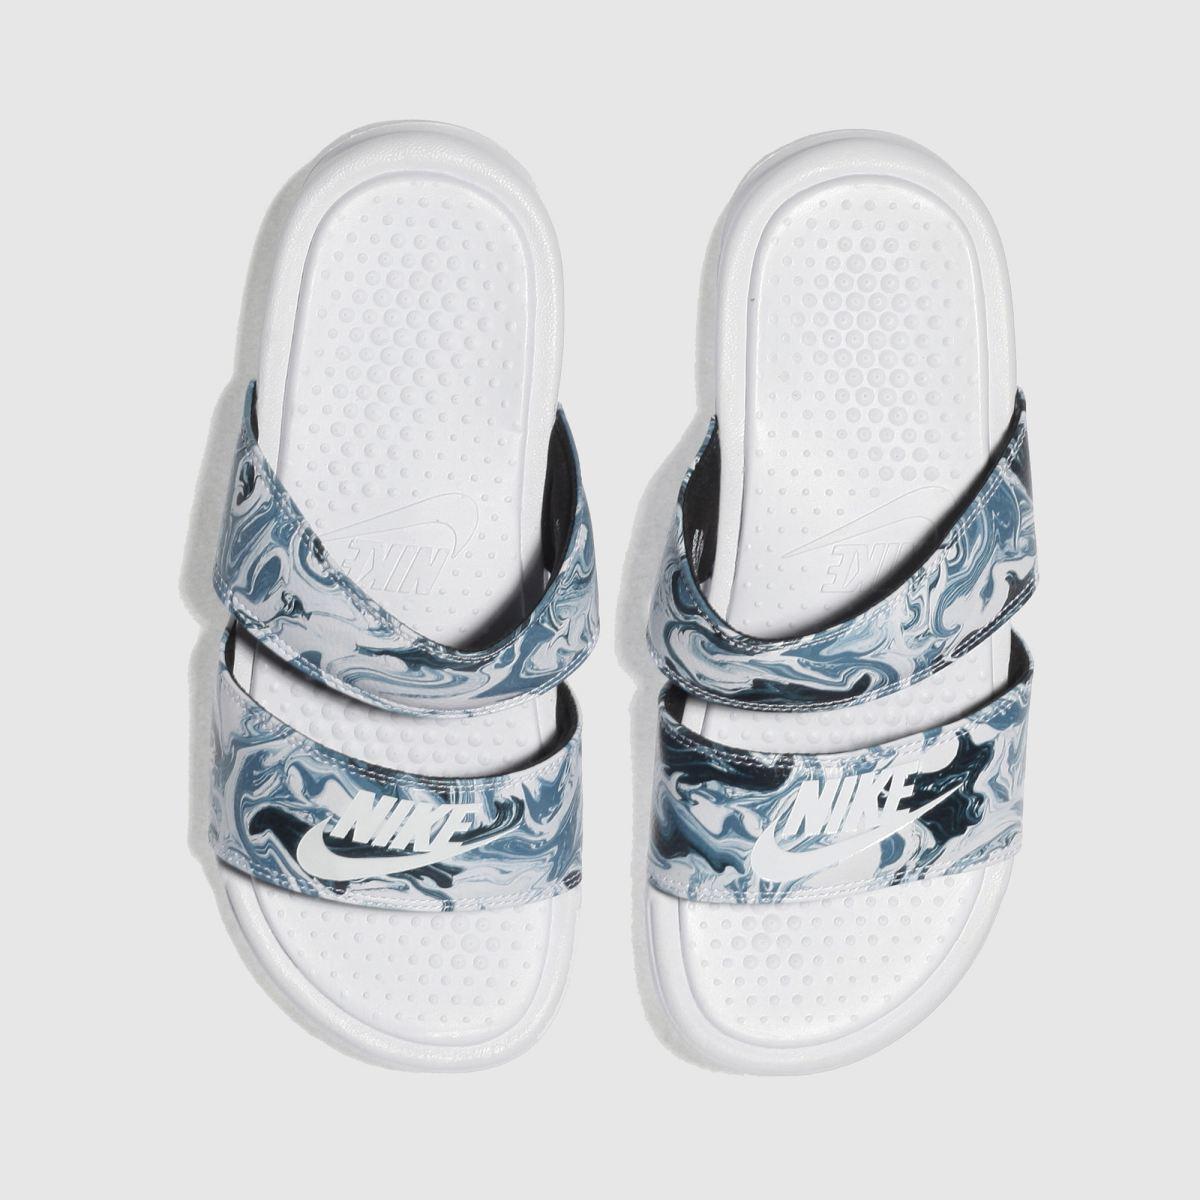 Nike White & Pl Blue Benassi Duo Ultra Slide Sandals